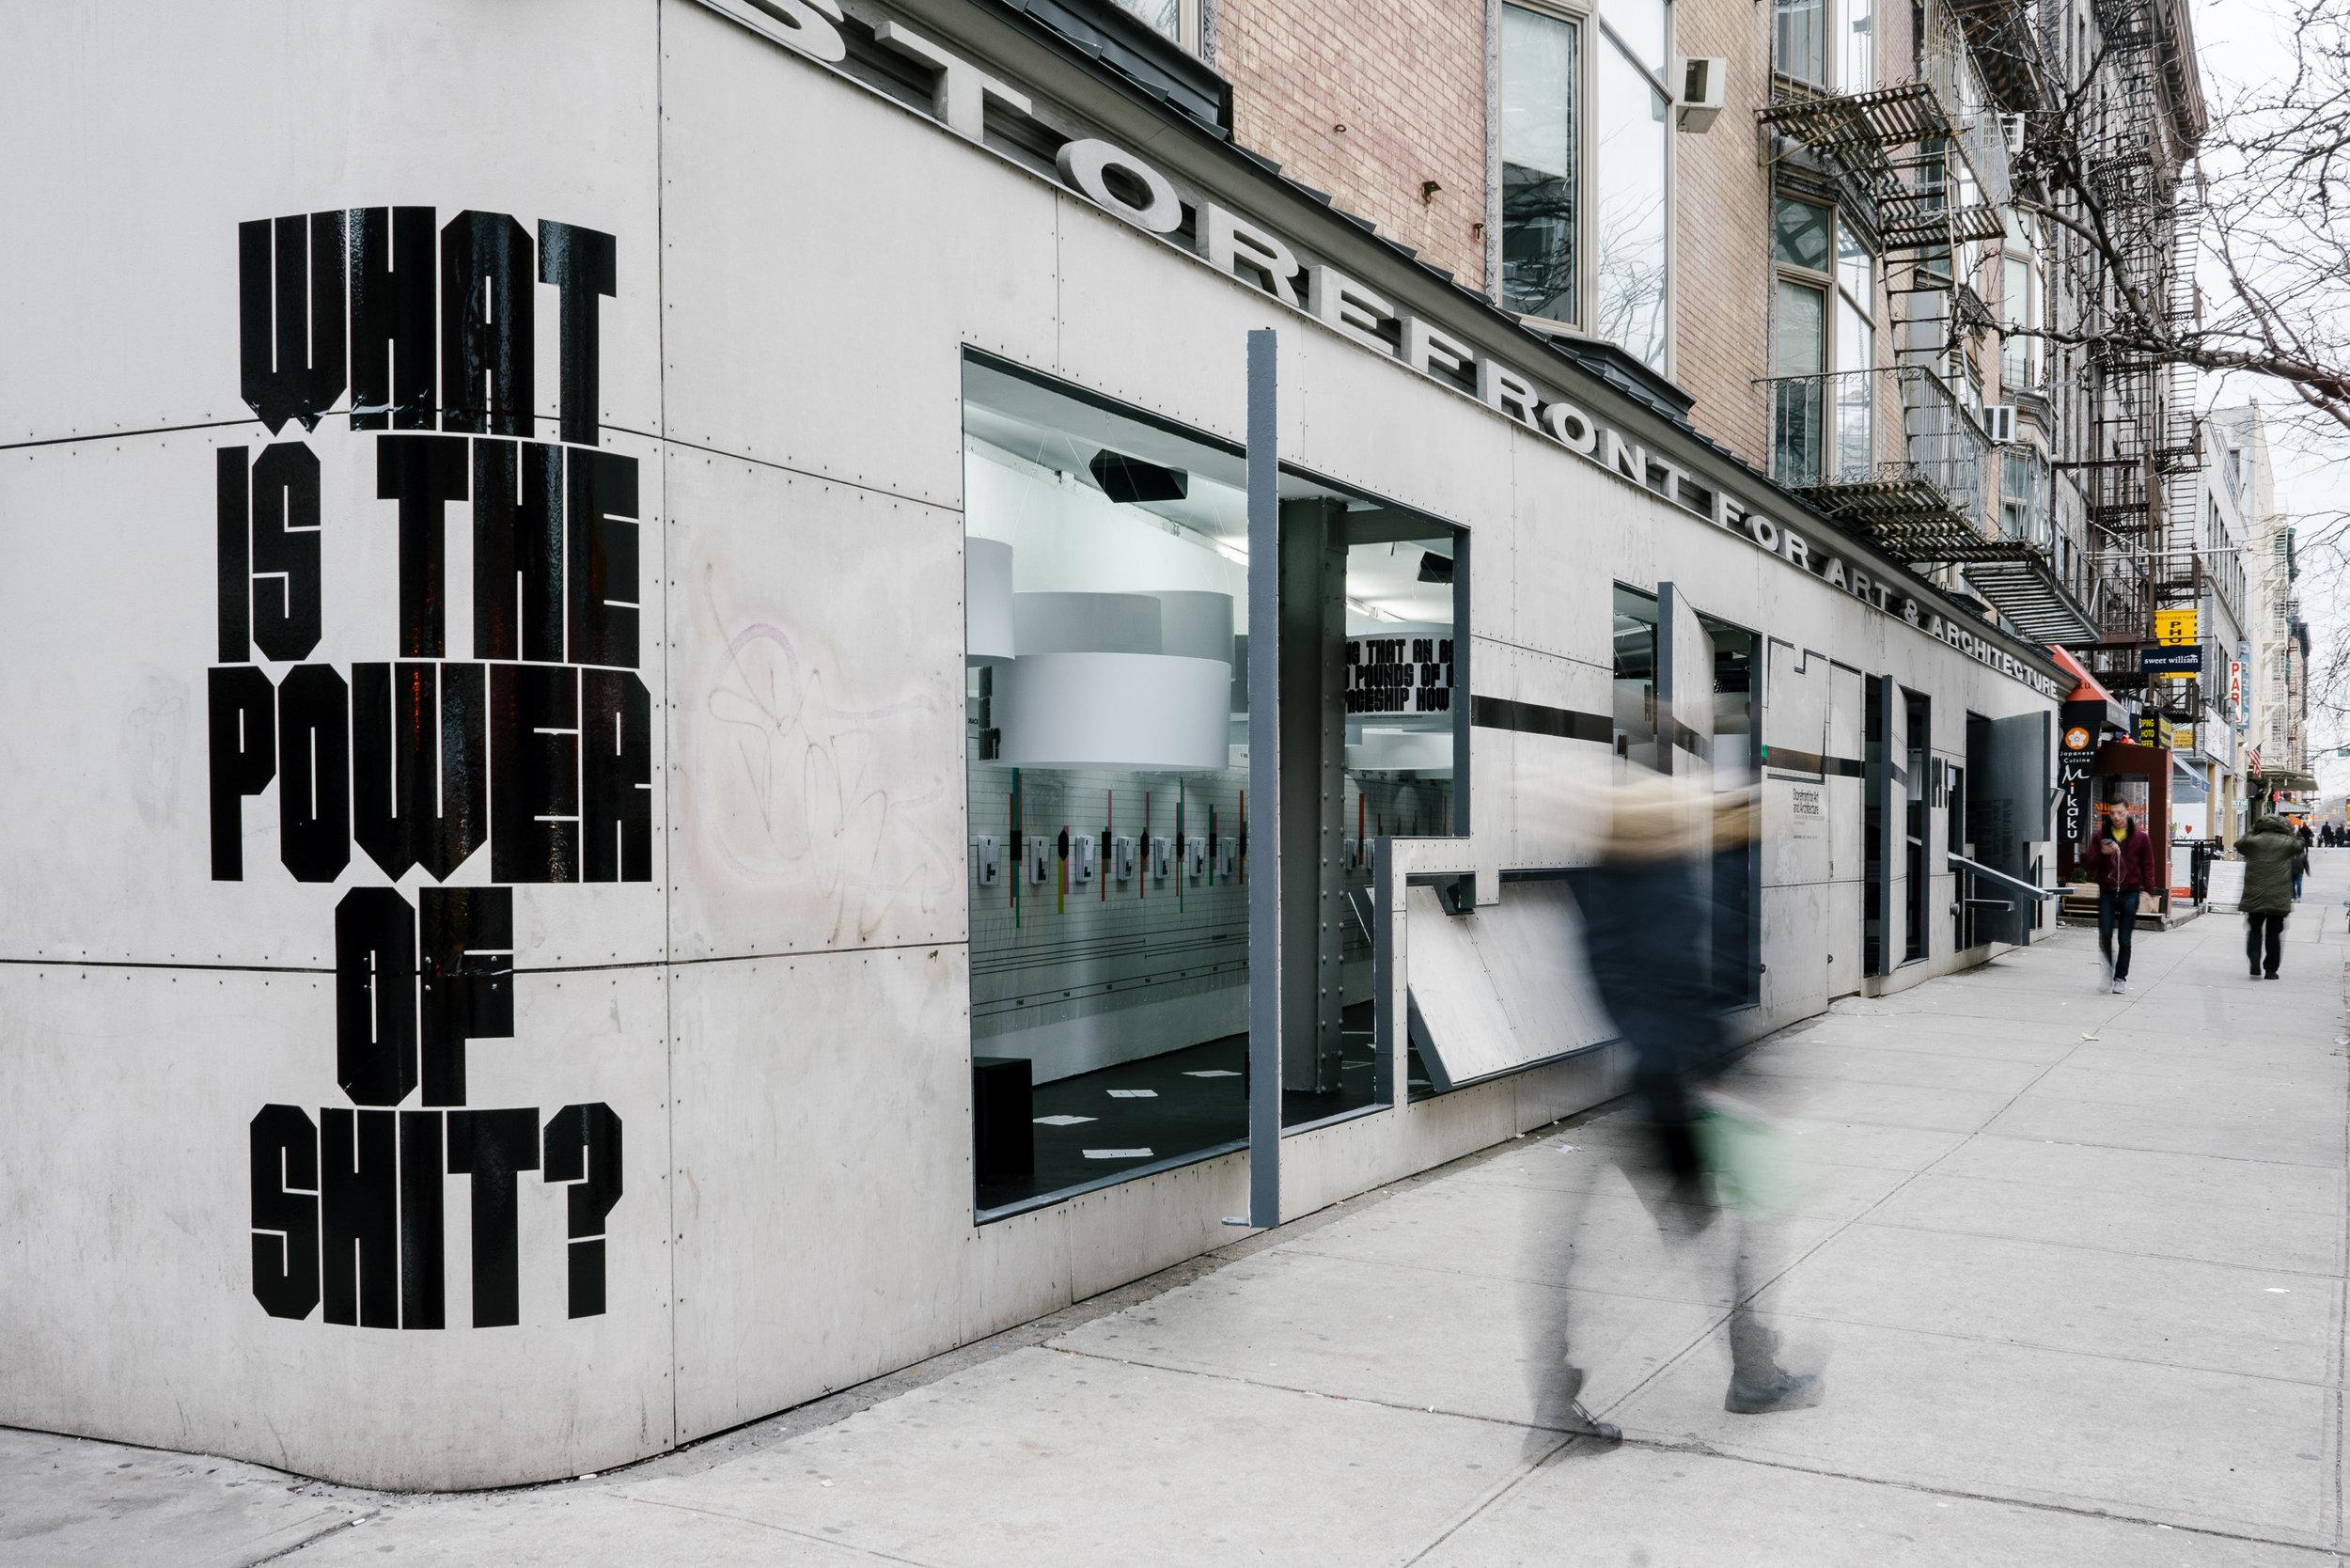 02 - Closed Worlds, 2016 - Lydia Kallipoliti- Storefront for Art and Architecture-Photo by Jake Naughton.jpg